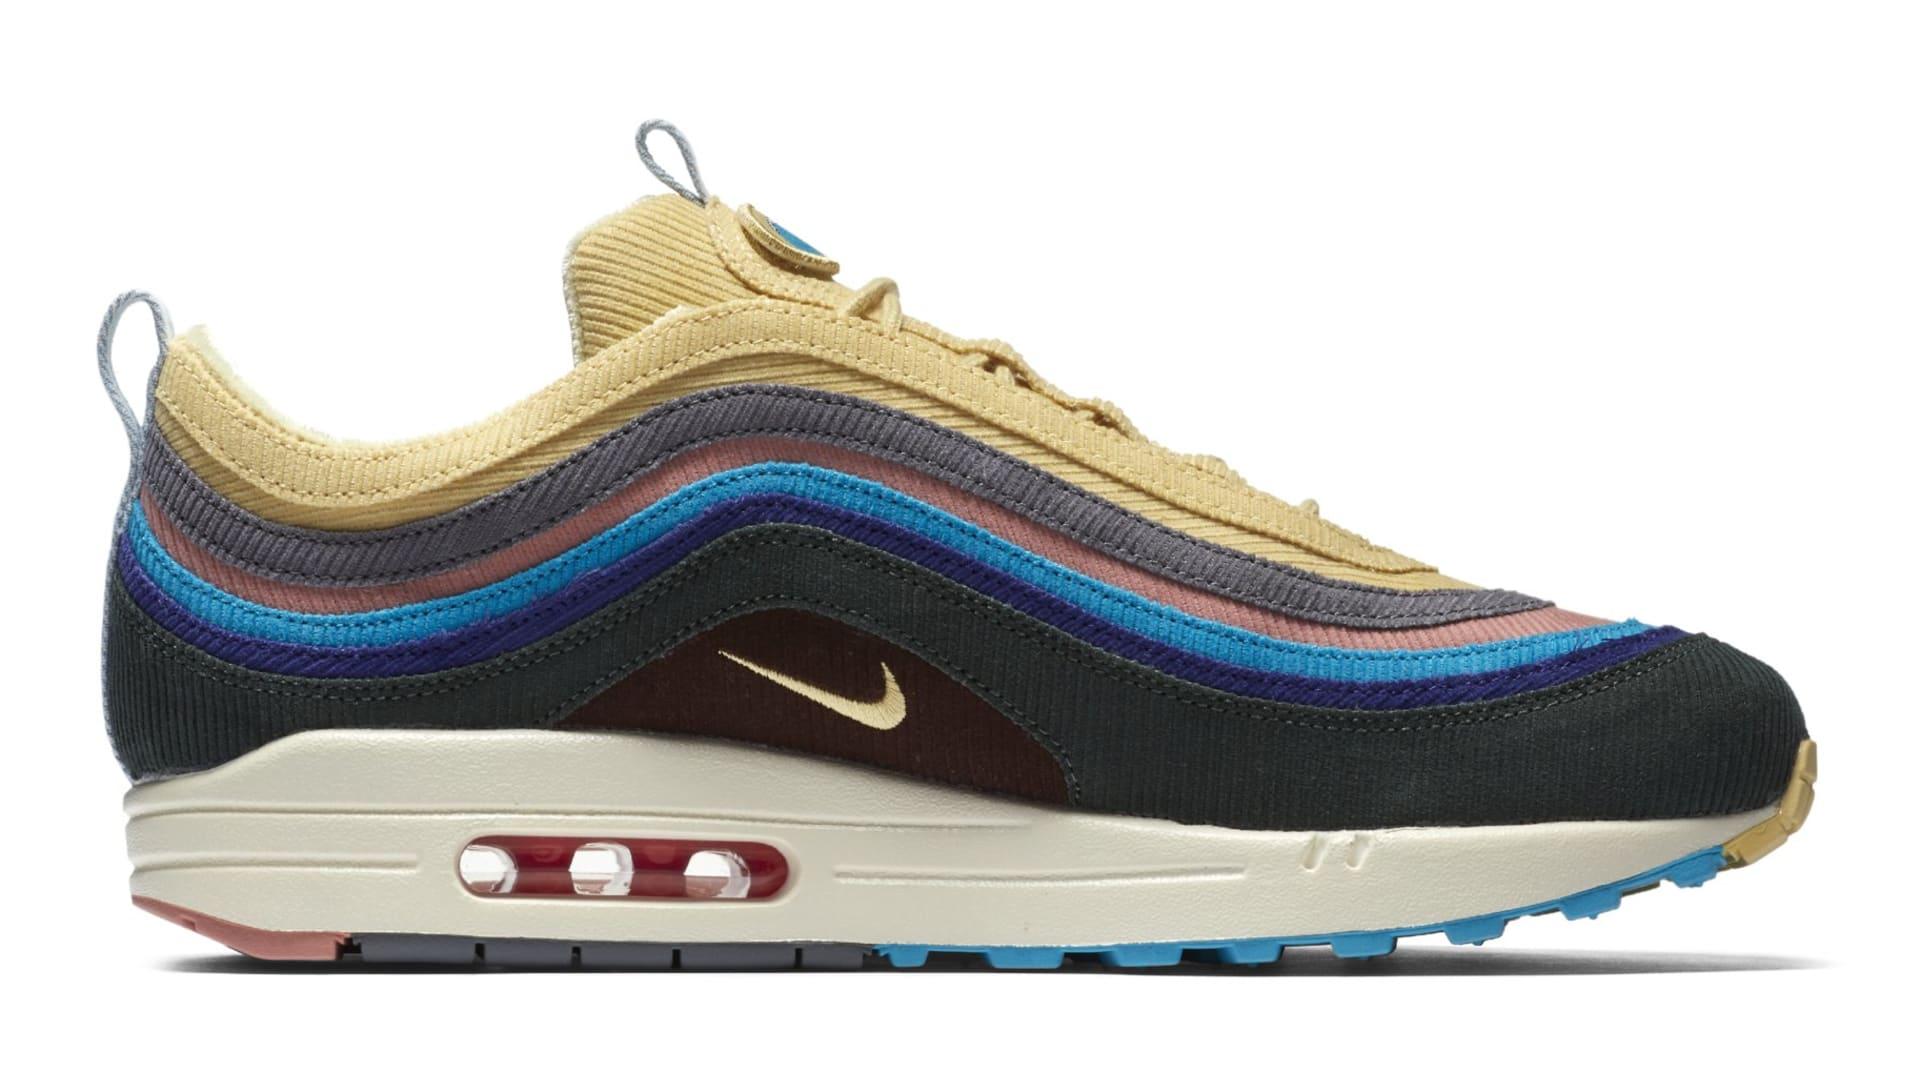 Sean Wotherspoon x Nike Air Max 1/97 AJ4219-200 (Medial)